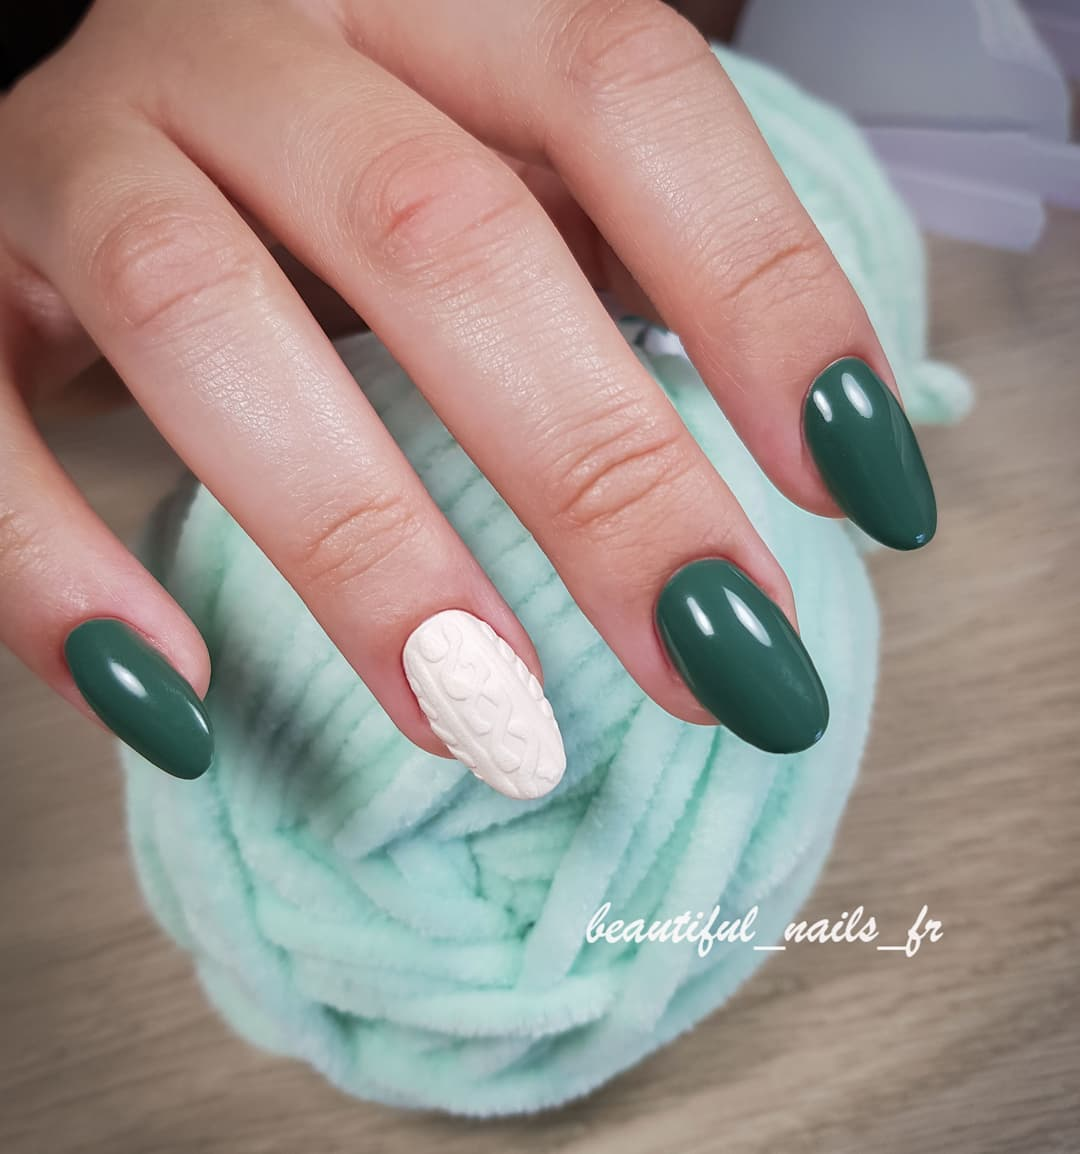 beautiful_nails_fr_231684104_370500994481564_5627575138075879652_n